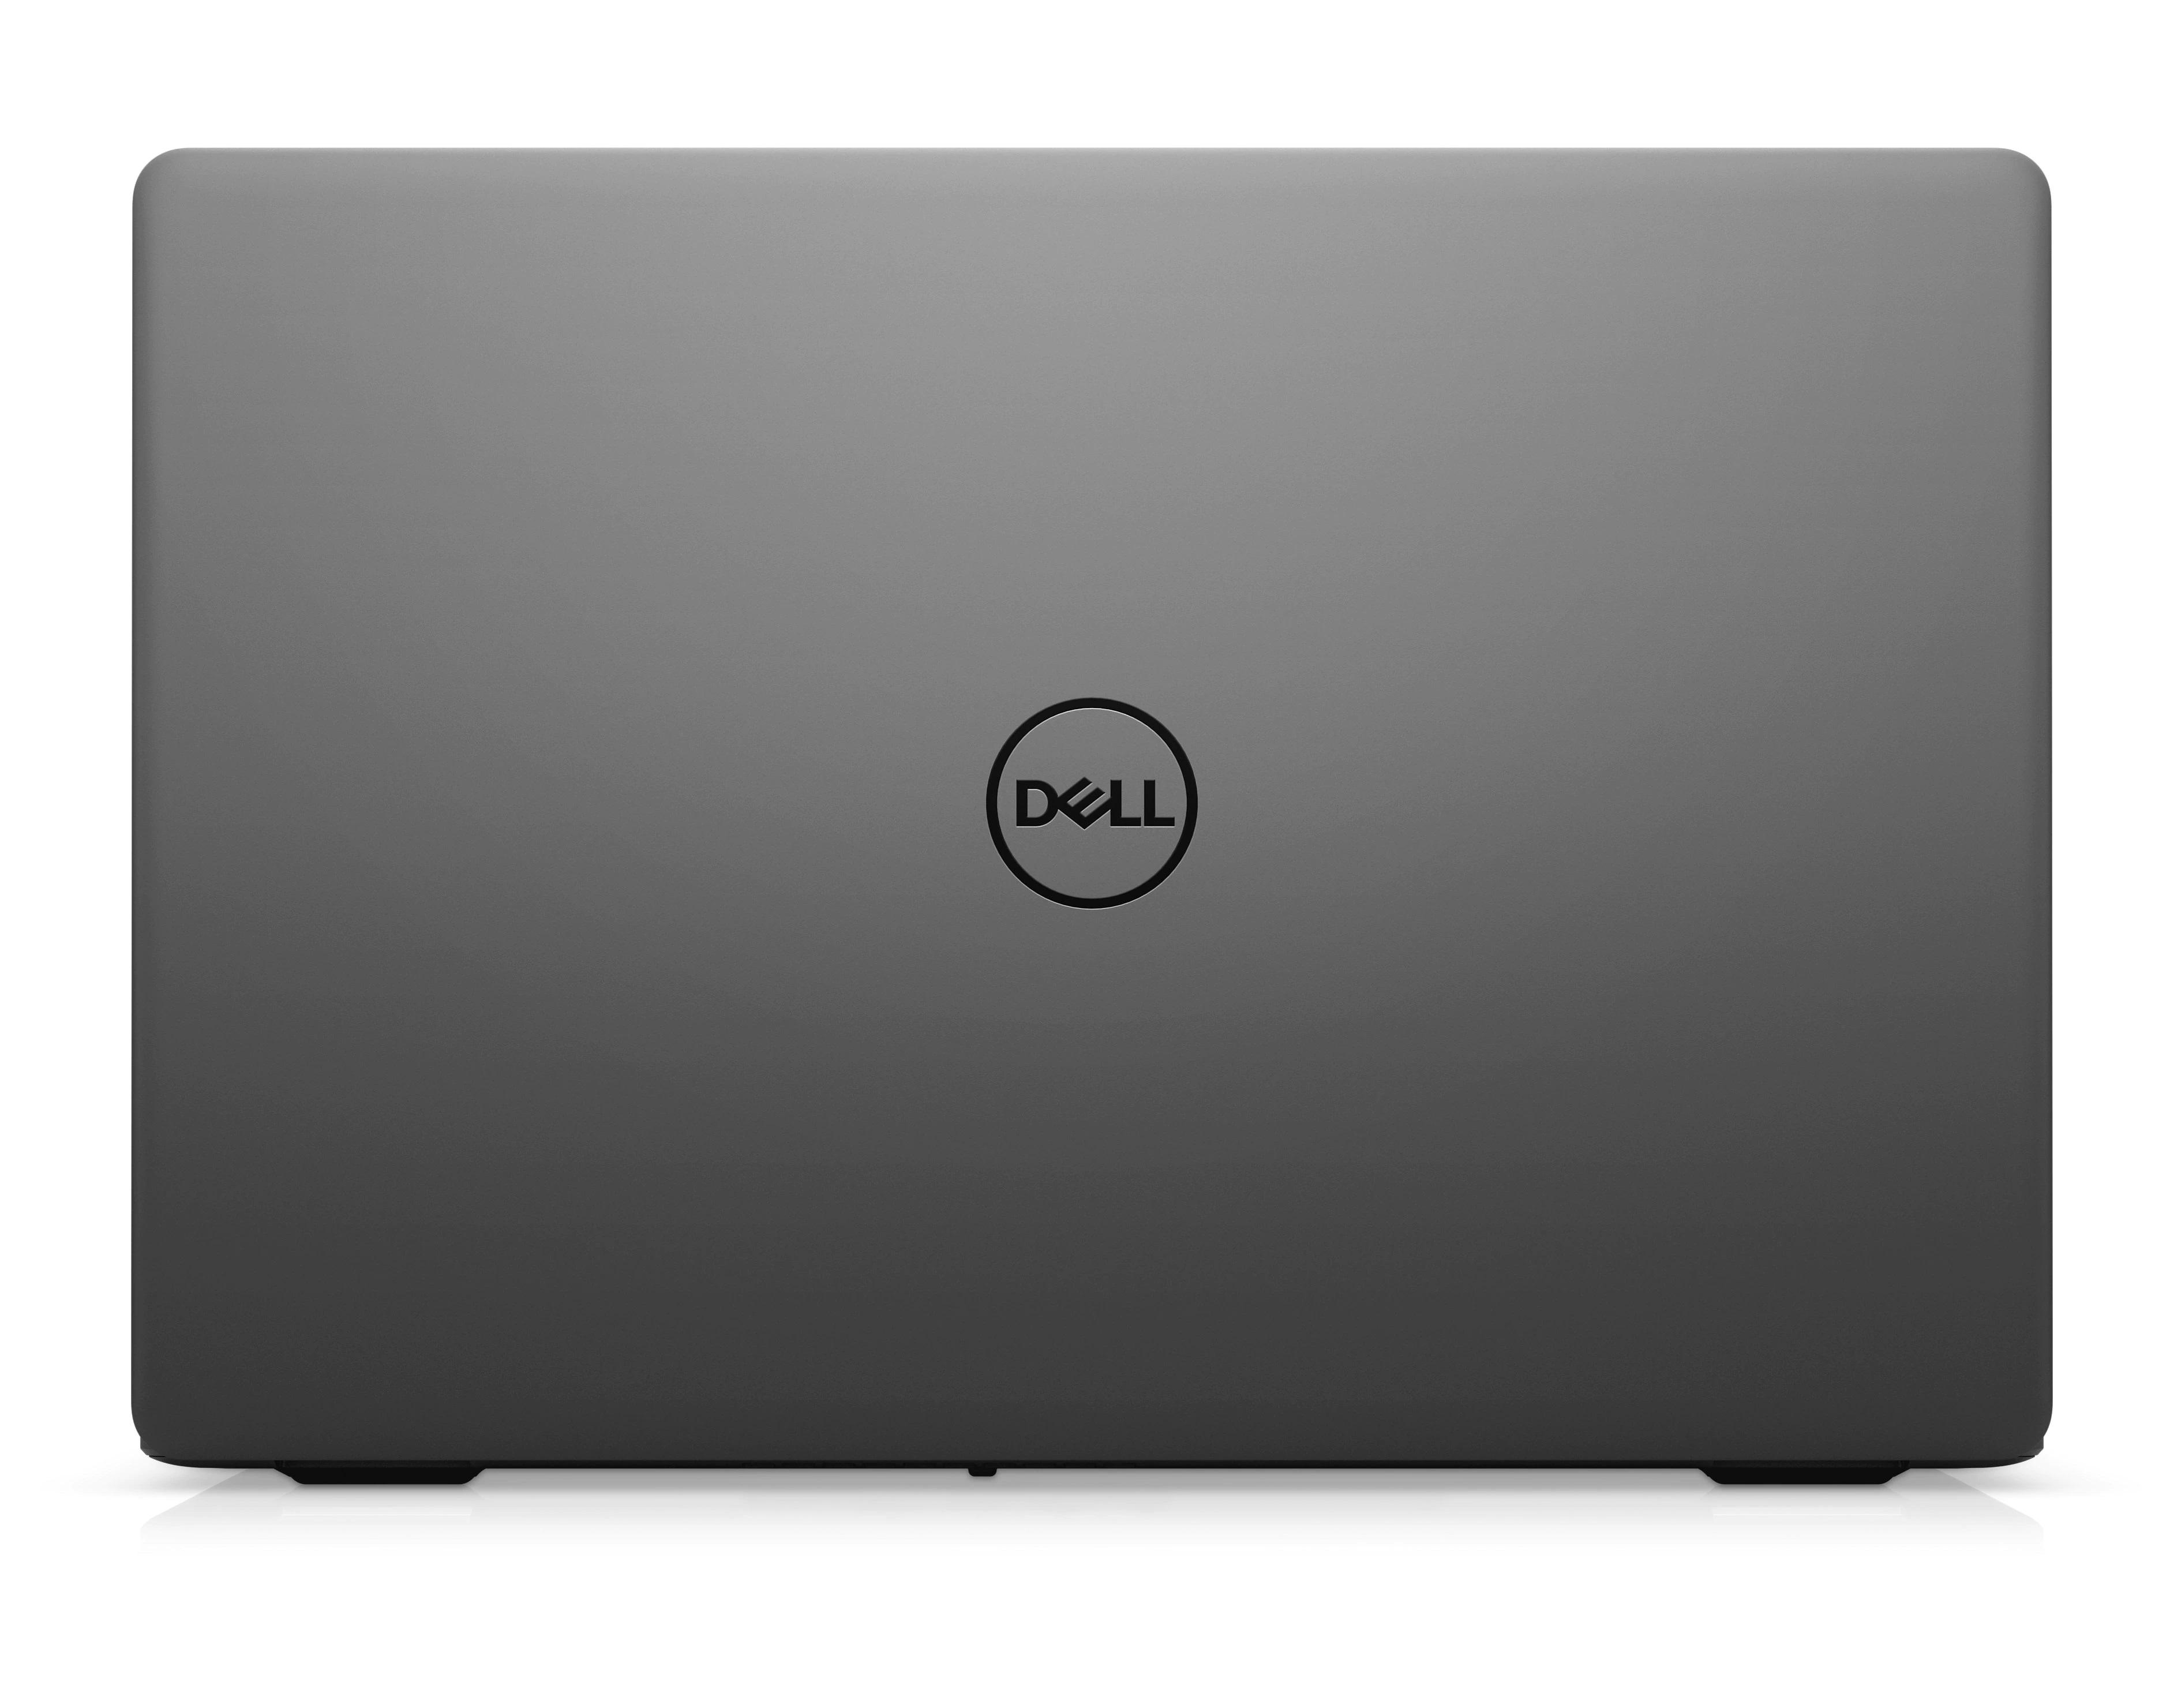 "Laptop 15.6"" DELL Inspiron 15 ICL 3000 (3501 / Intel Core i3 / 4GB / 256GB SSD / Win10HE / Black"